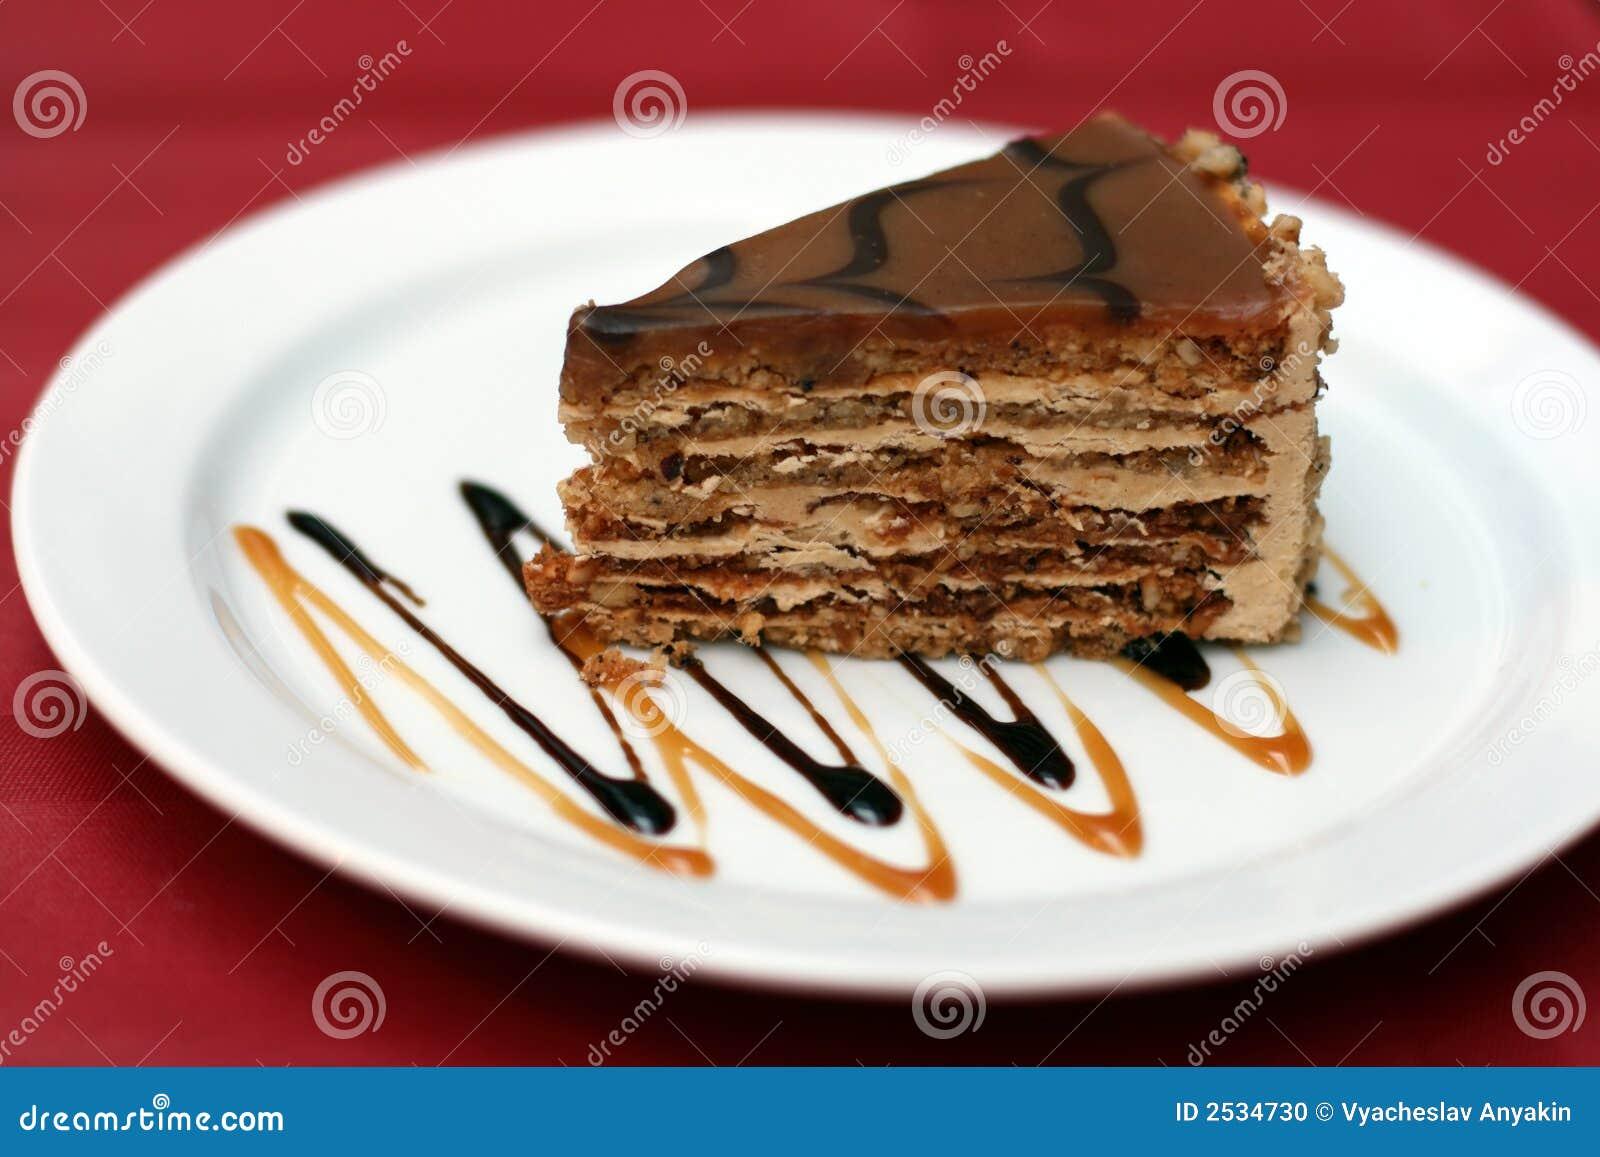 Dessertfancy cake stock photo Image of food dark frosting 2534730